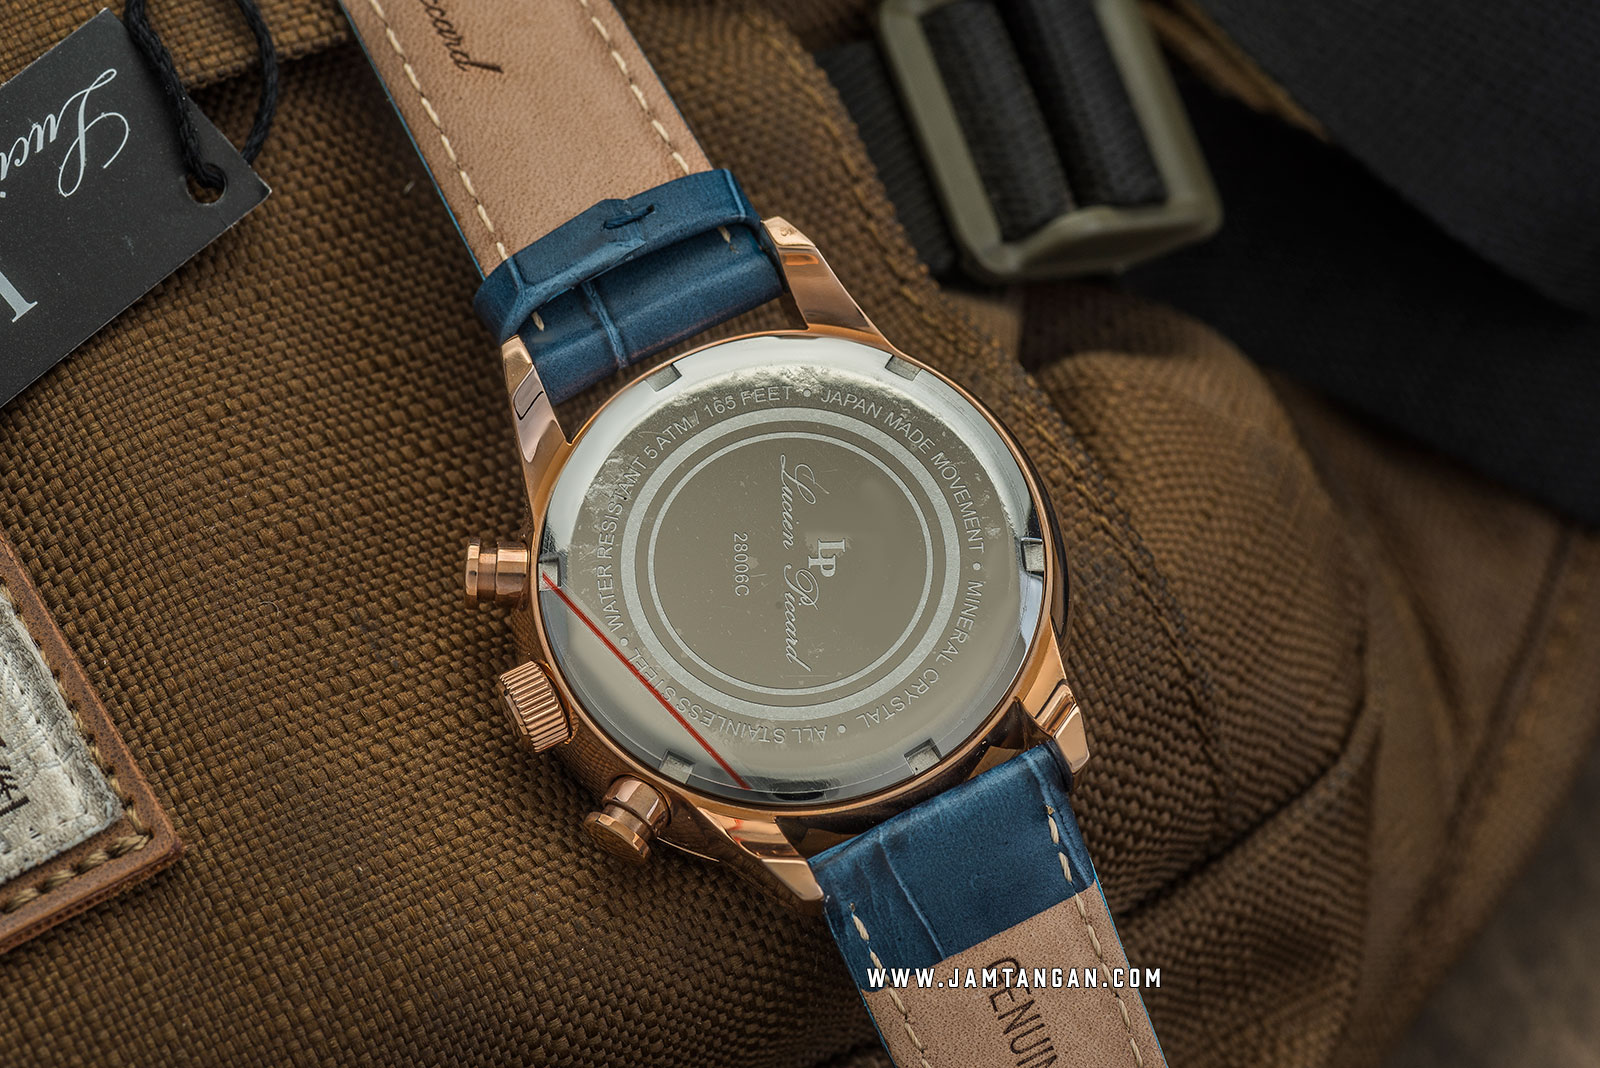 Lucien Piccard Welles LP-28006C-RG-03-BLS Chronograph Blue Dial Blue Leather Strap Machtwatch